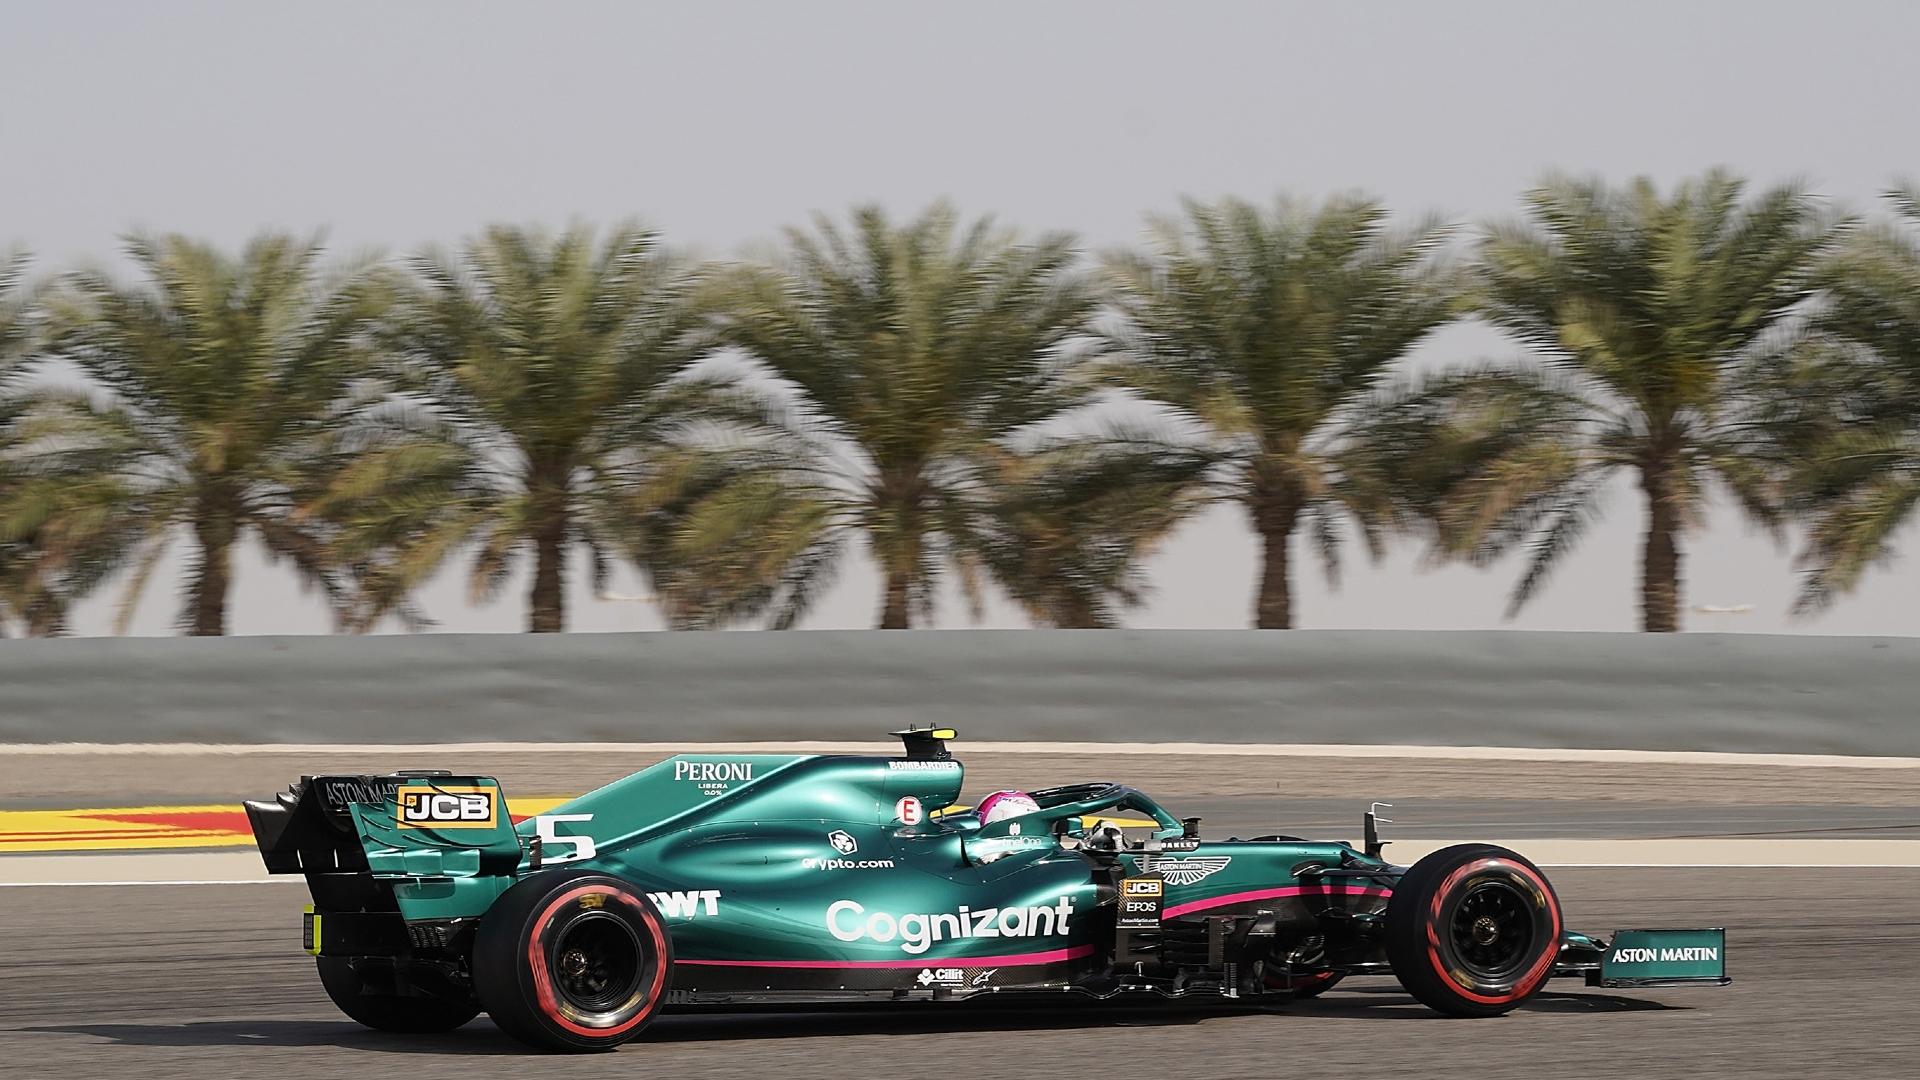 Sebastian Vettel dirige carro da Aston Martin em treino livre do GP do Bahrein